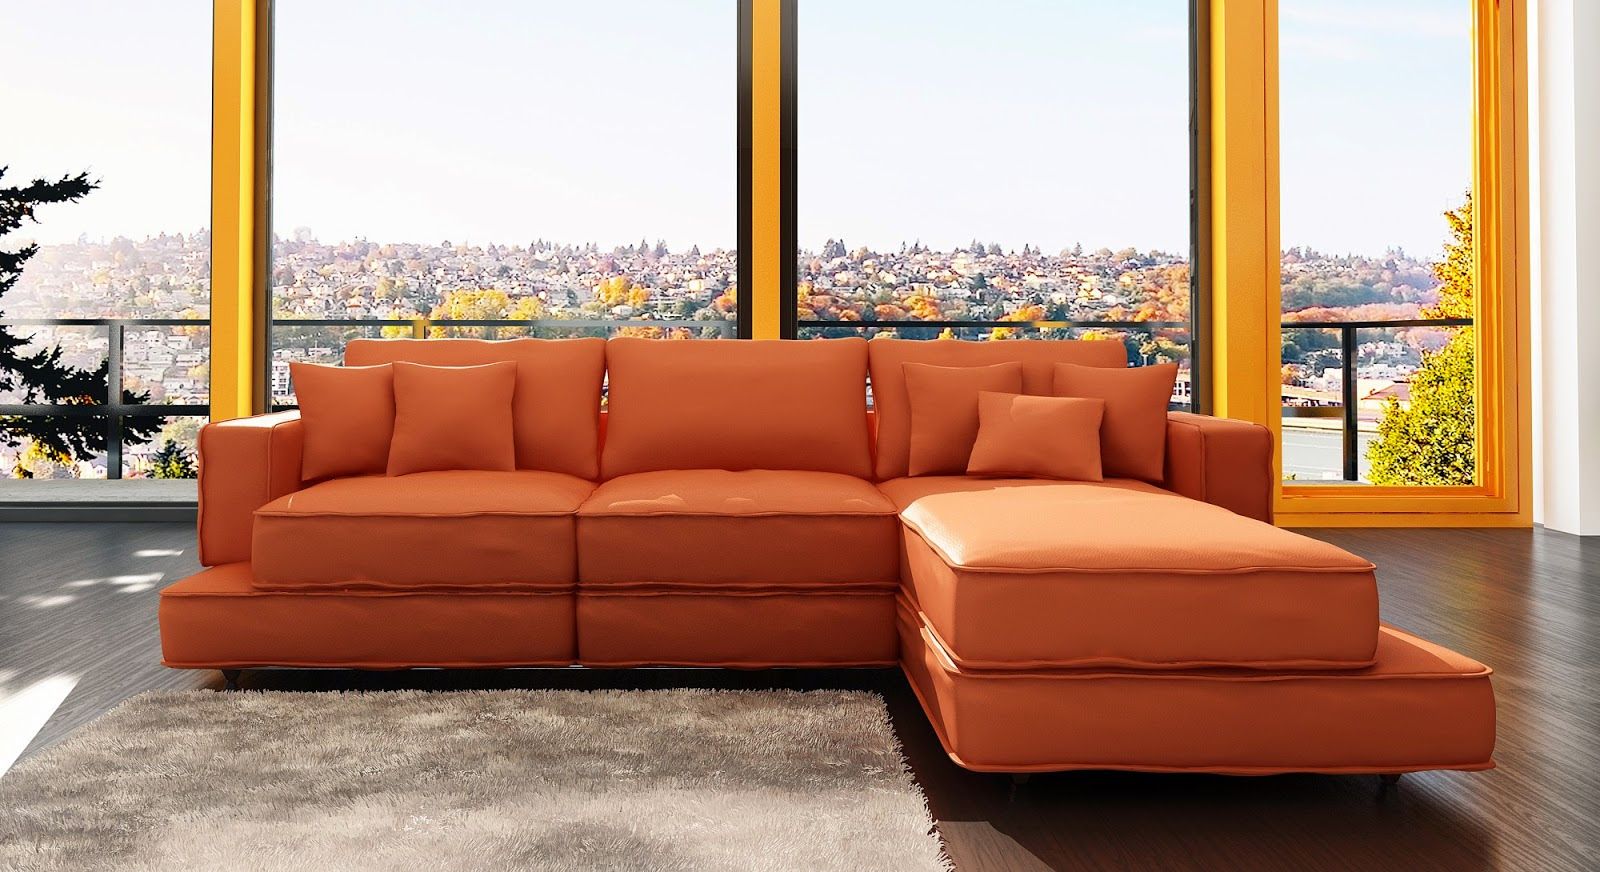 Living Room With Orange Couch Nagpurentrepreneurs